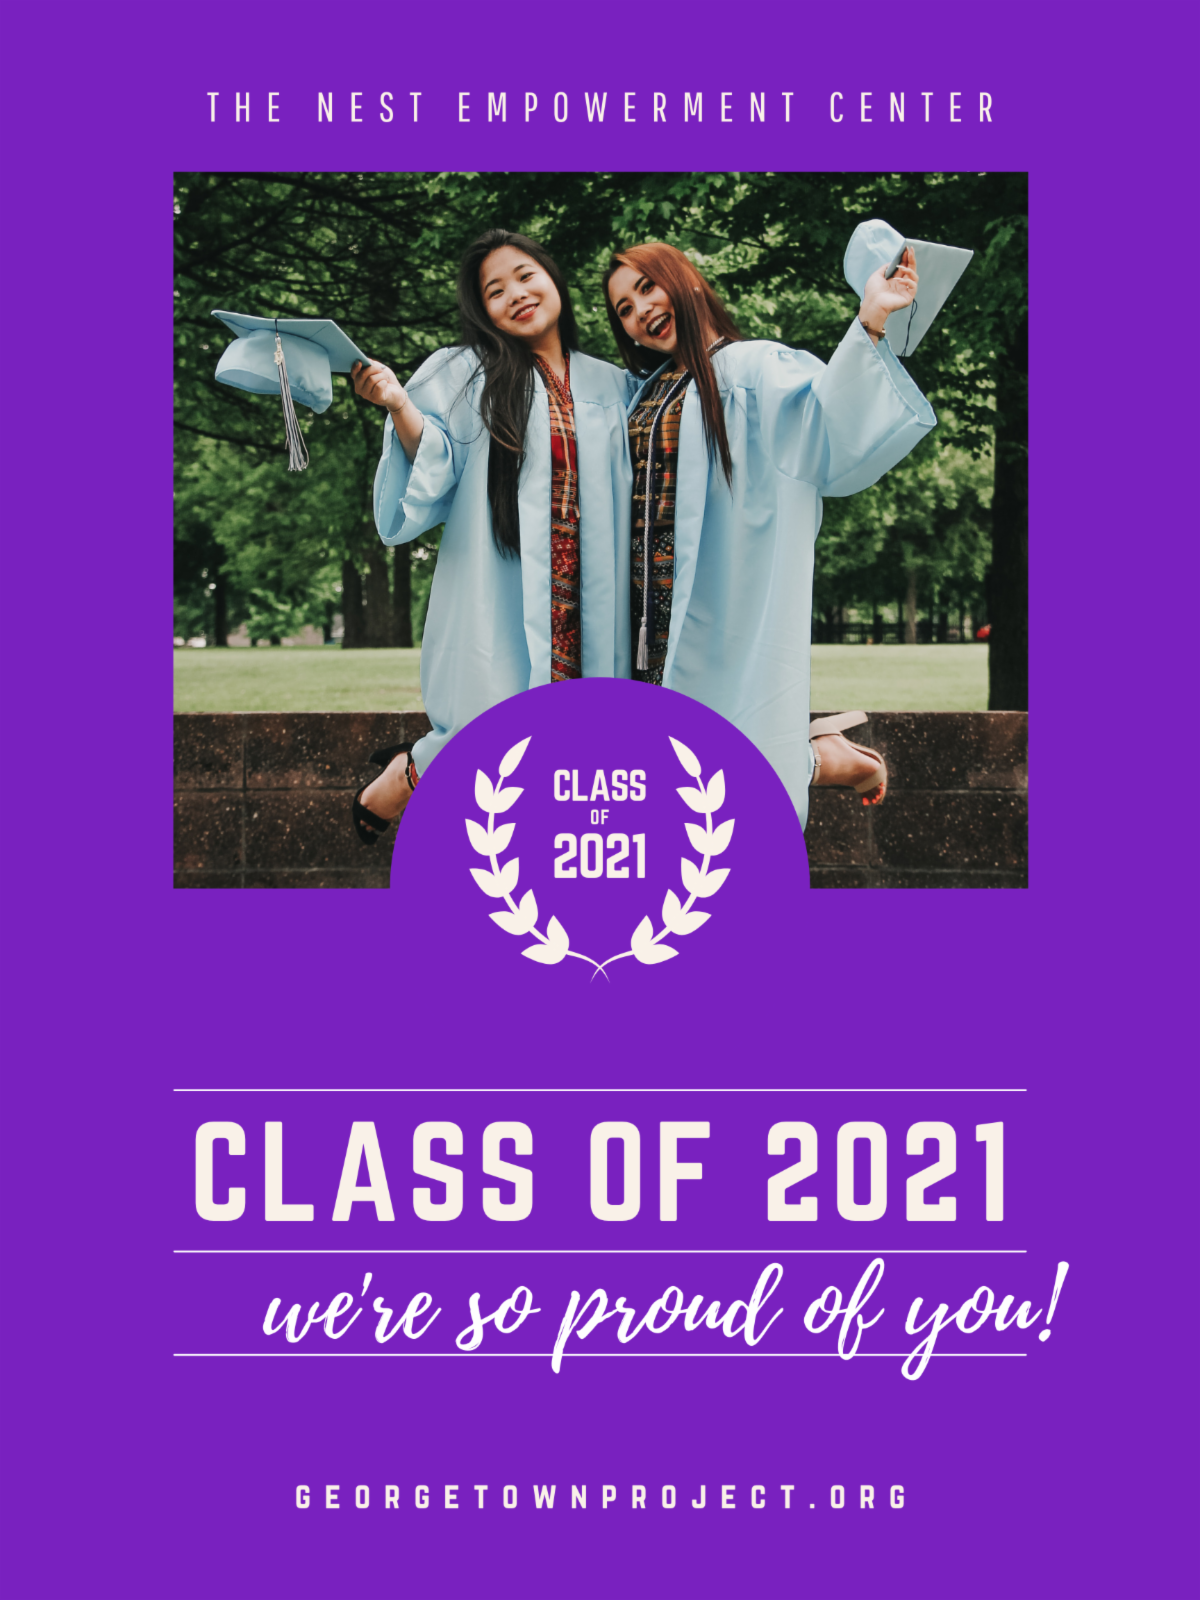 graduates the nest